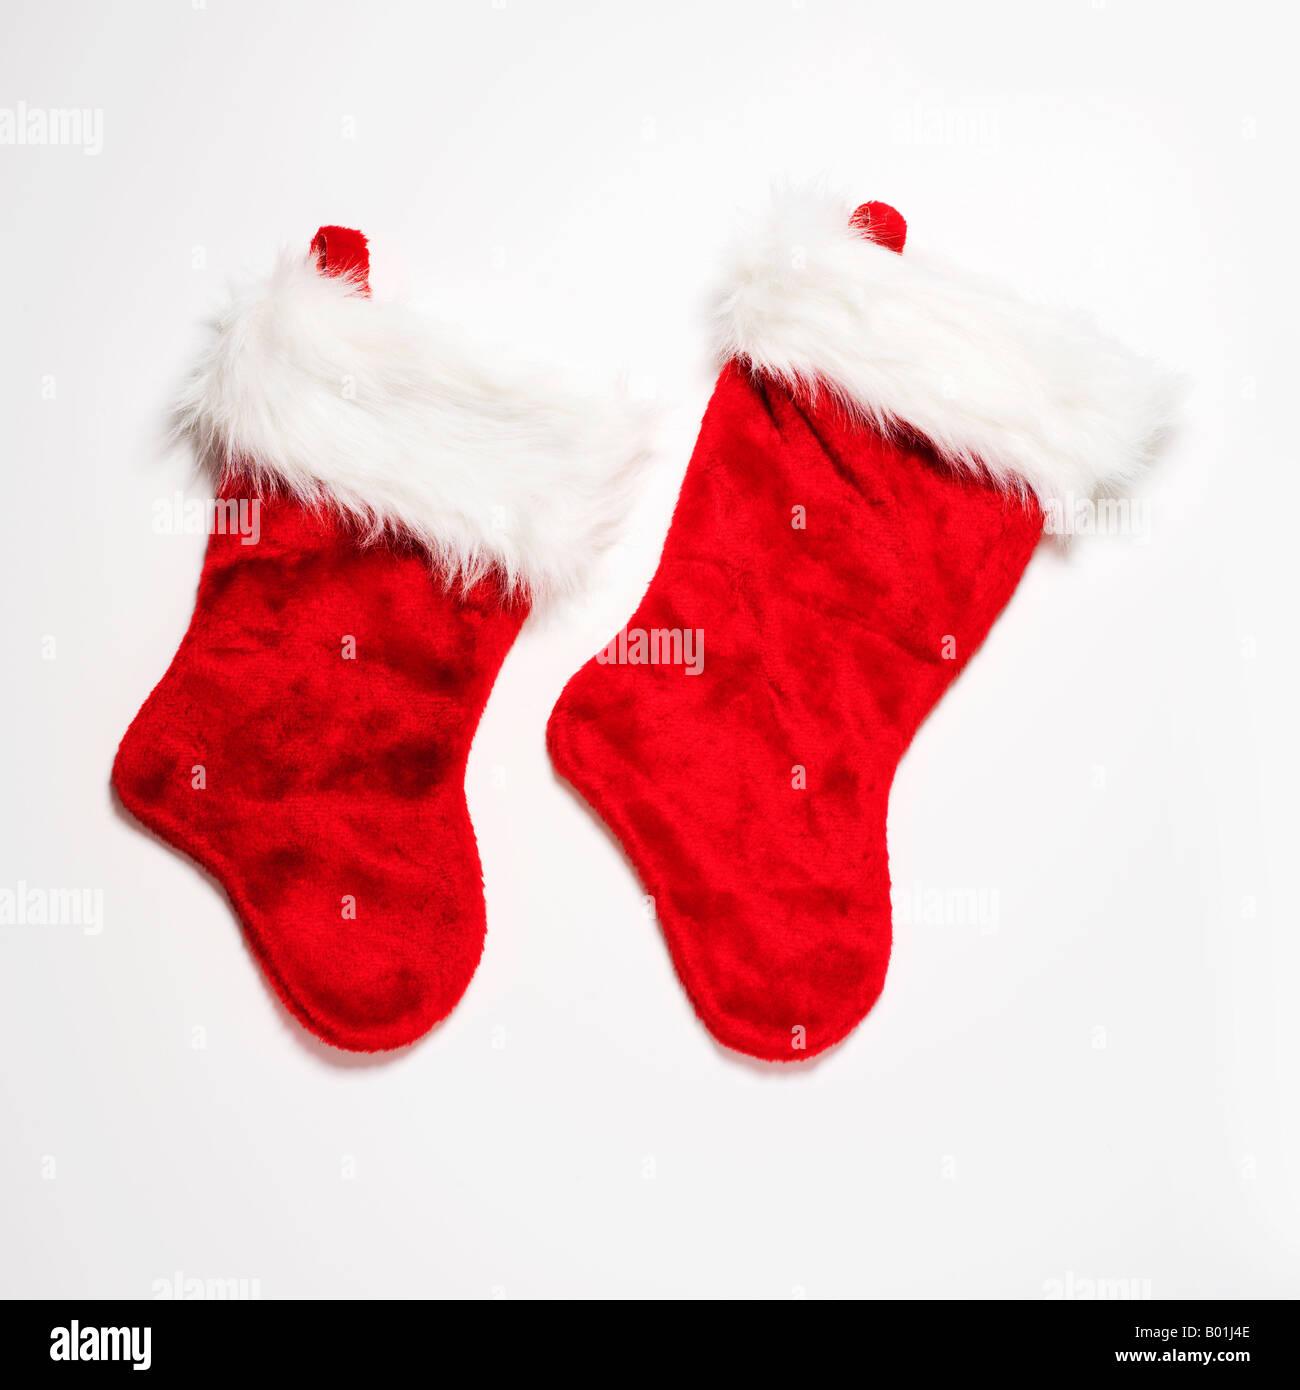 red Christmas stockings - Stock Image